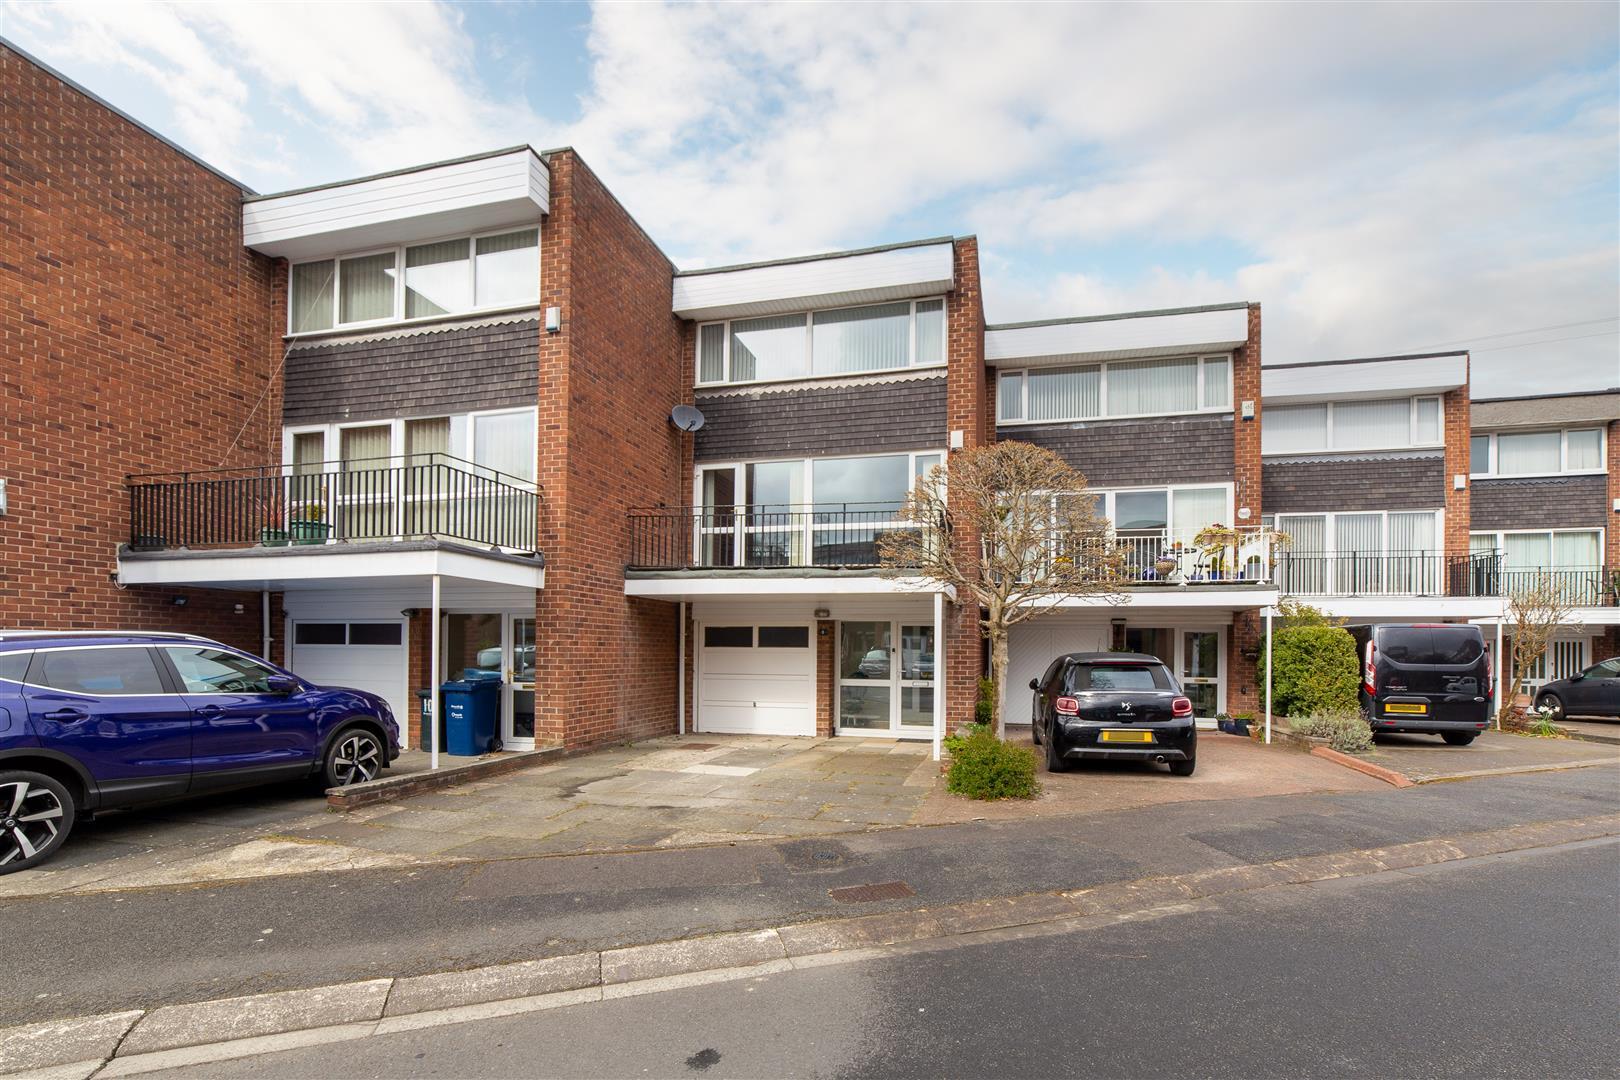 3 bed terraced house for sale in Princes Close, Brunton Park, NE3